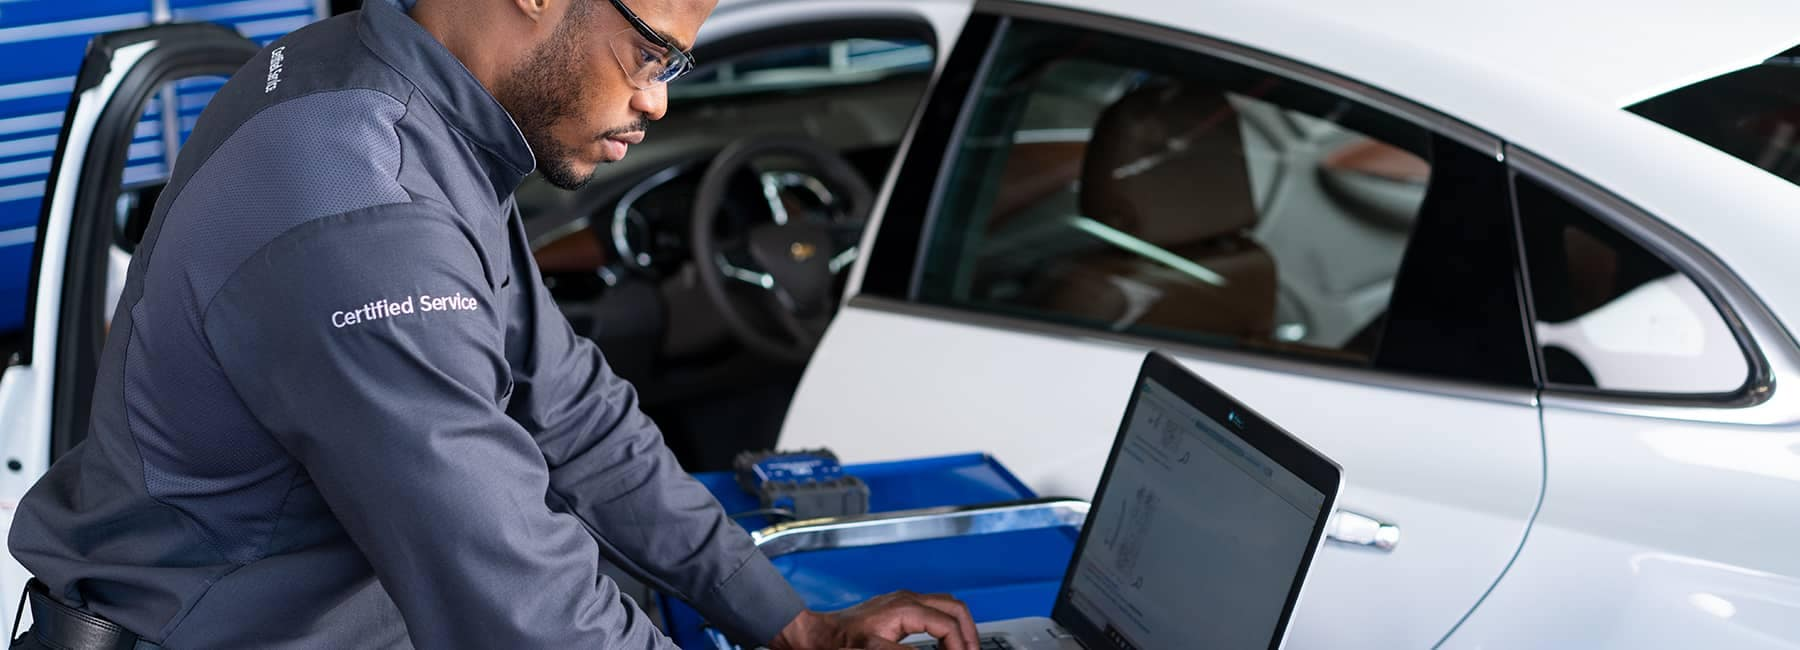 Chevrolet Service Technician Running Diagnostic on A Car